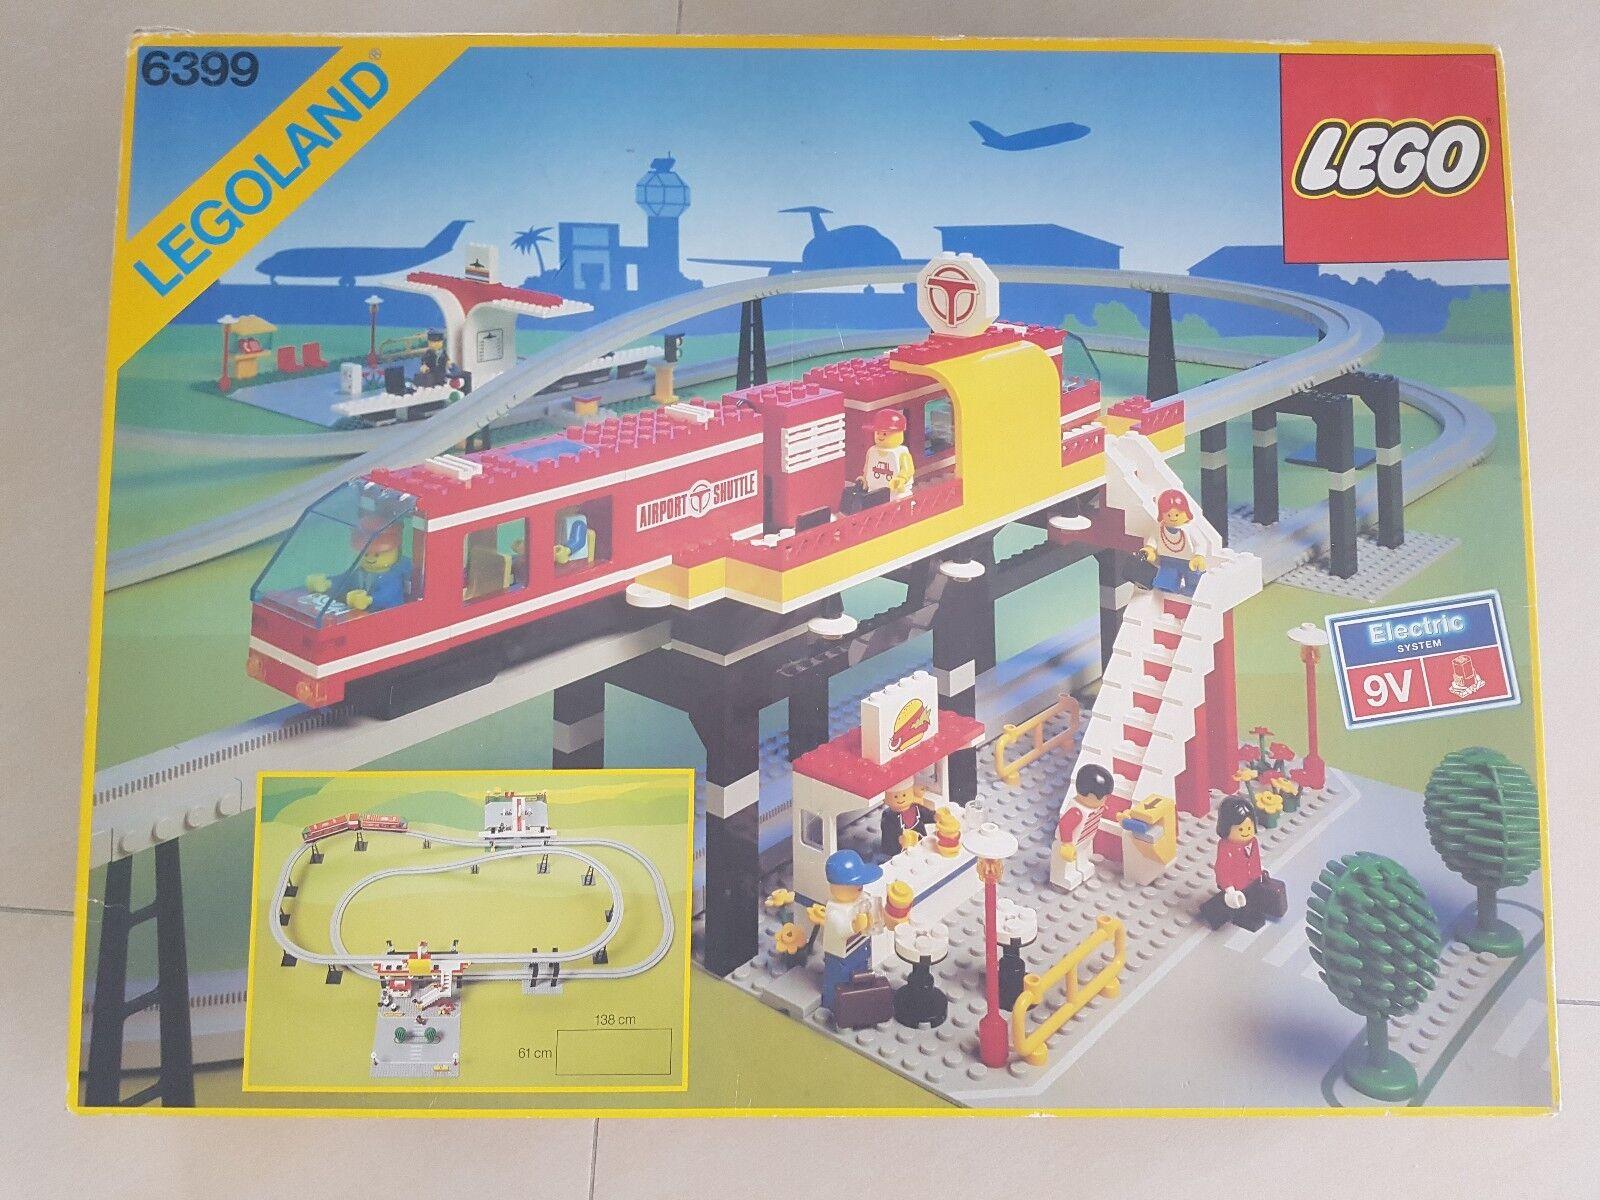 LEGO Legoland 6399 6399 6399 Airport Shuttle Monorail komplett mit Anleitung 6fdad2